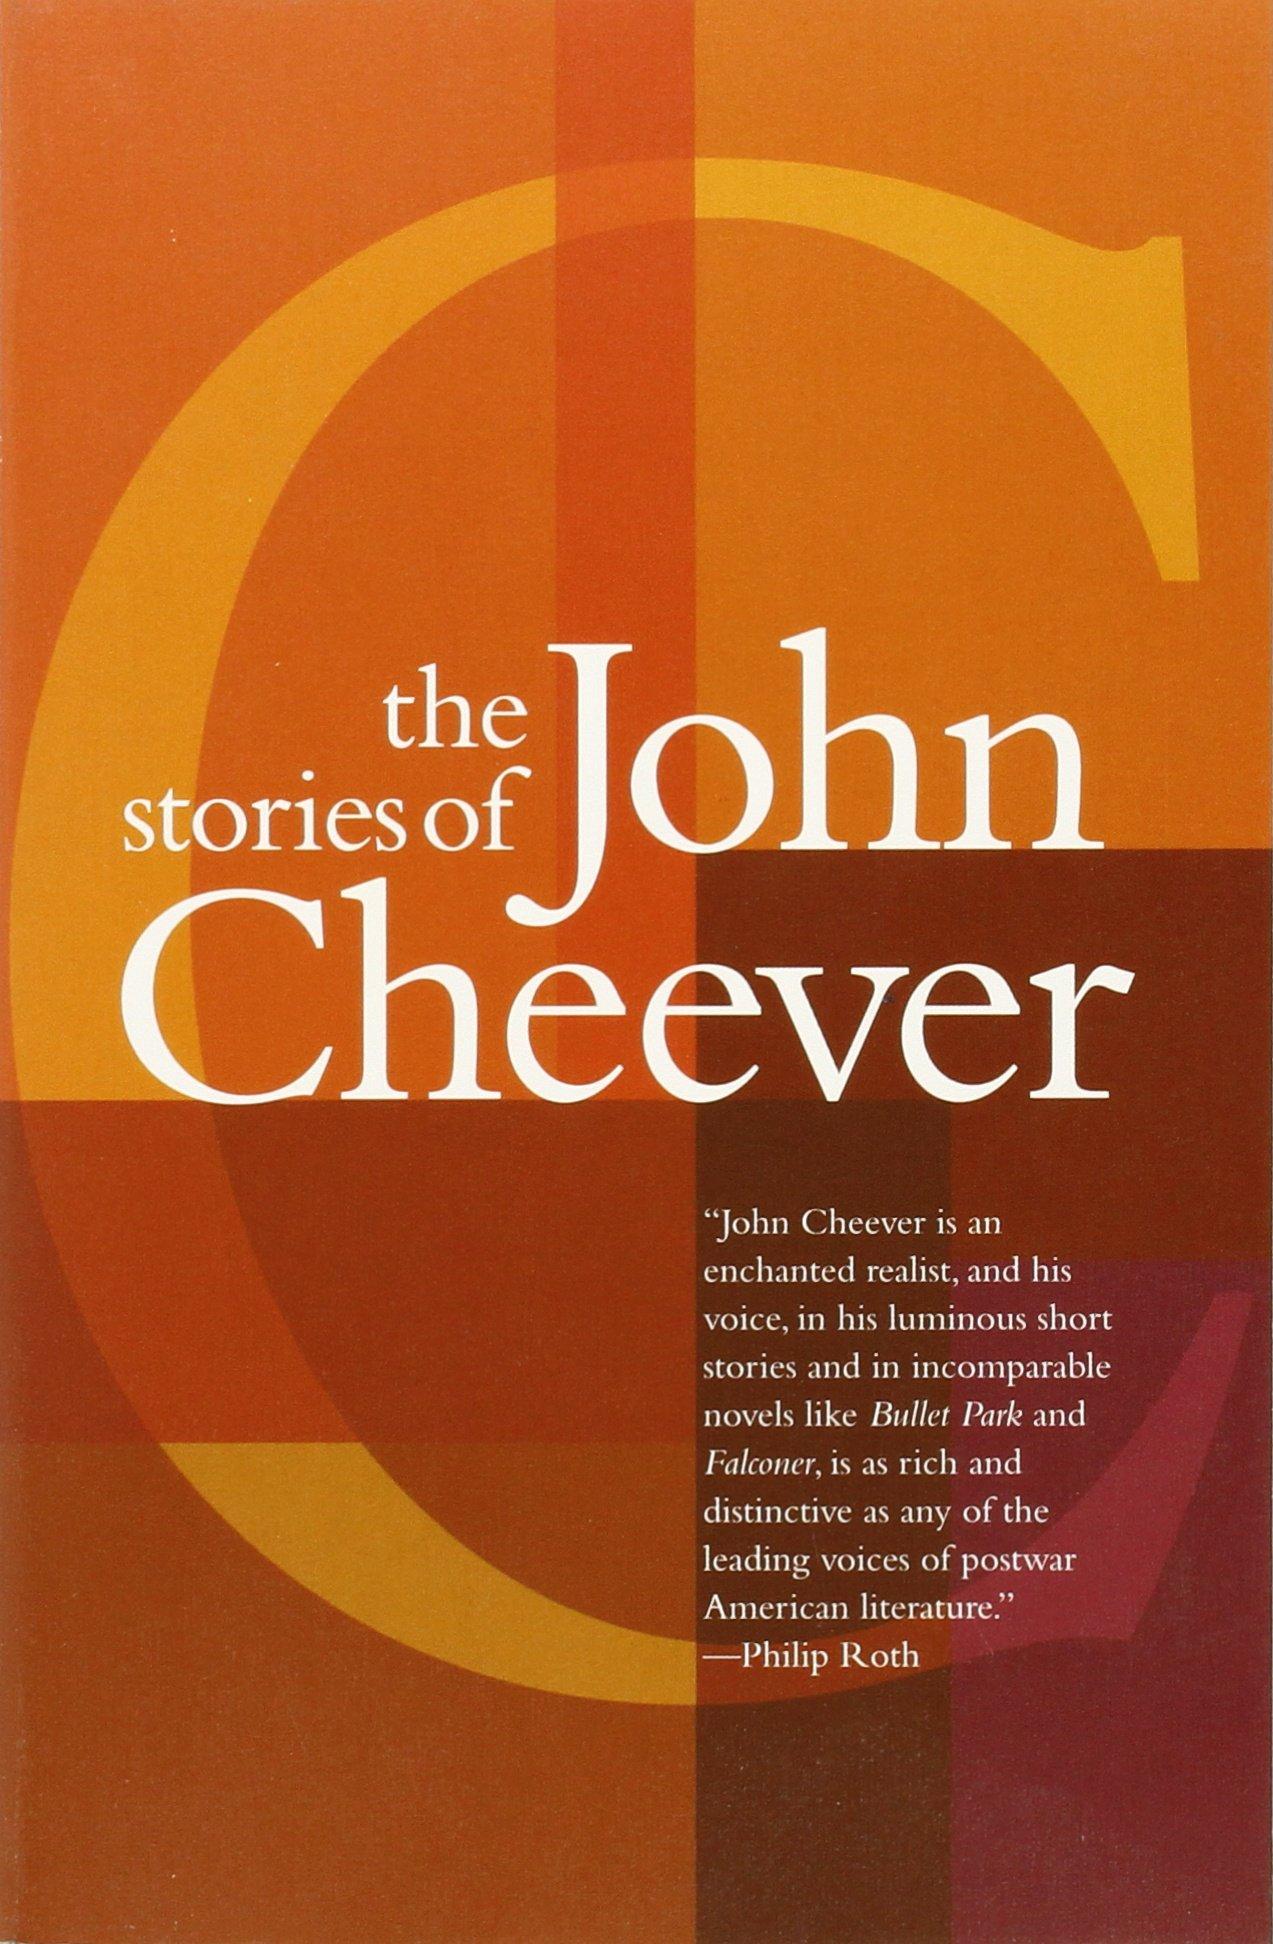 The Stories of John Cheever: John Cheever: 9780375724428: Amazon.com: Books